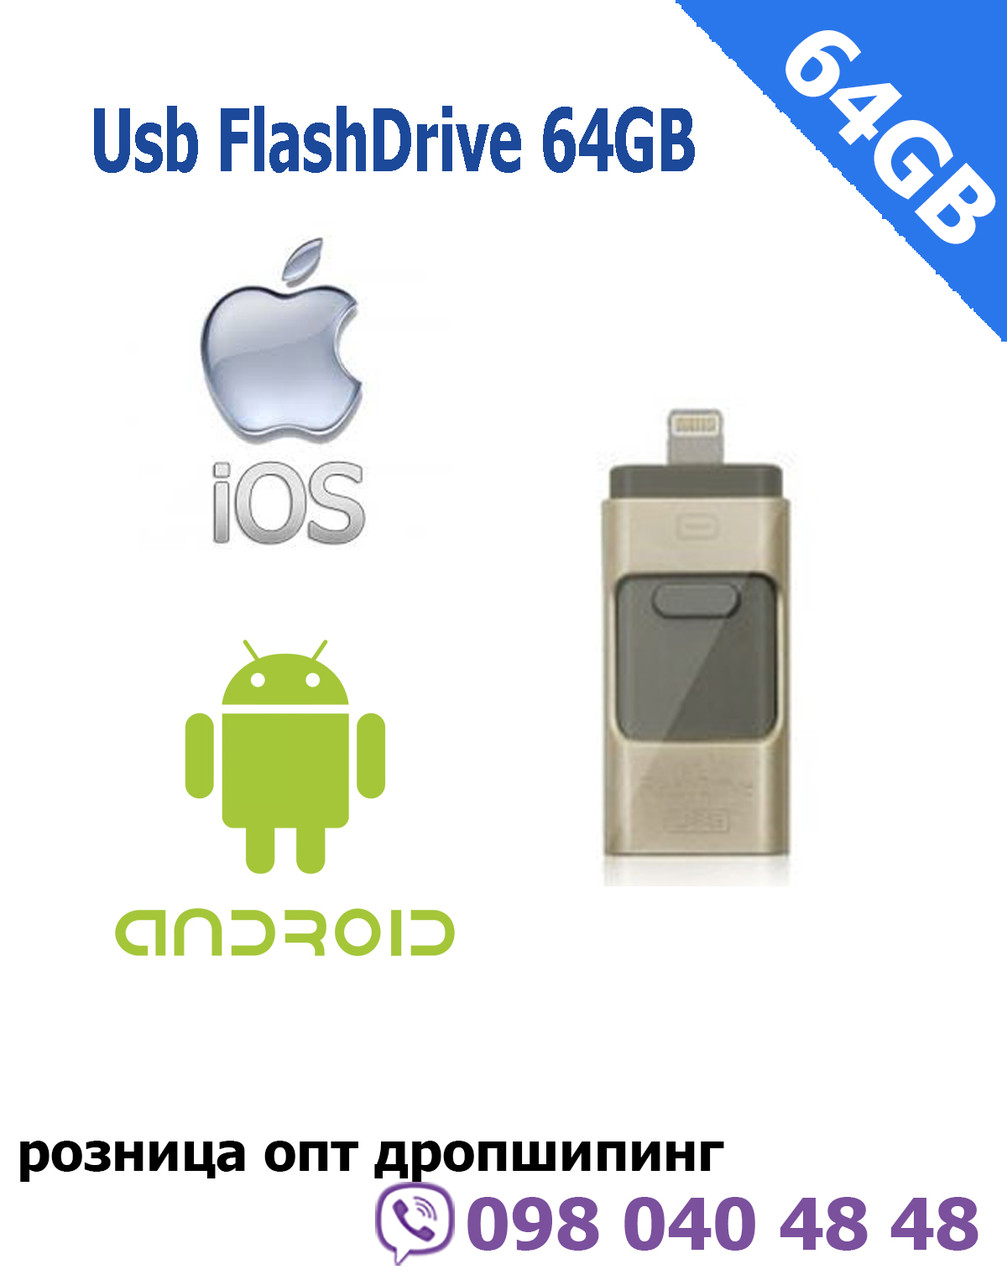 Флешка i-Flash Drive   64GB для iOS/Android